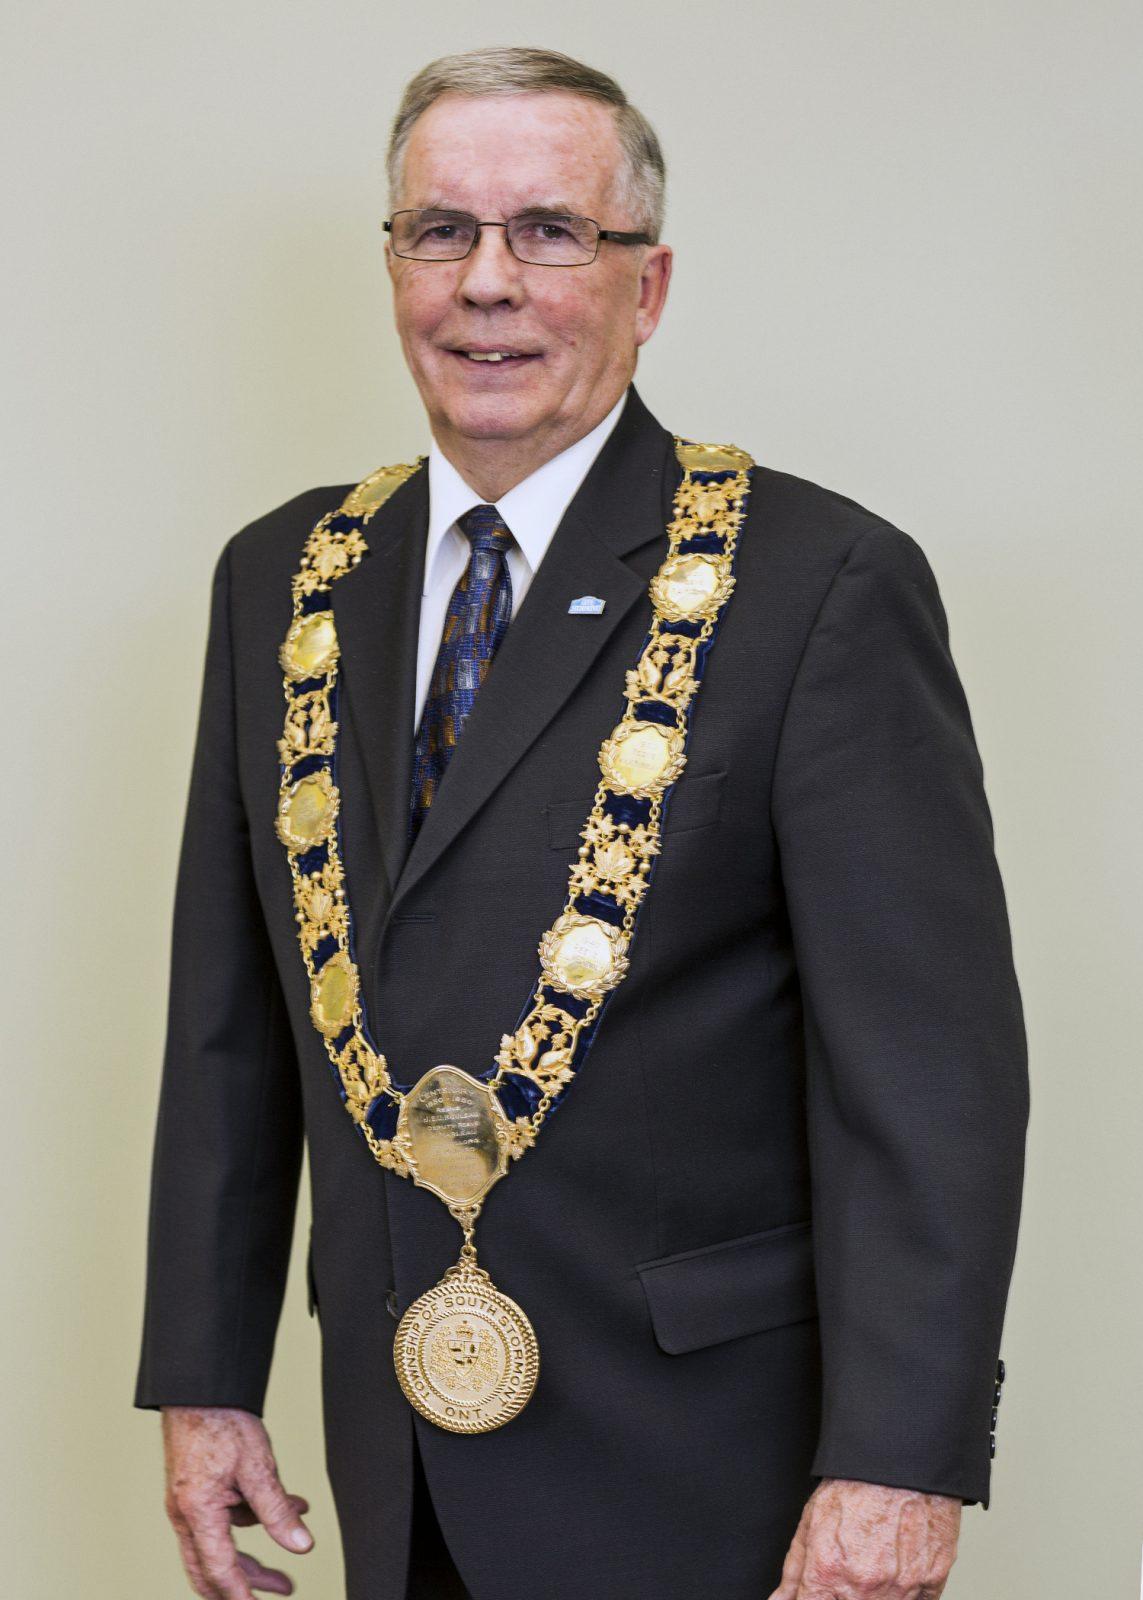 Mayor Bancroft calls school closures an attack on rural communities